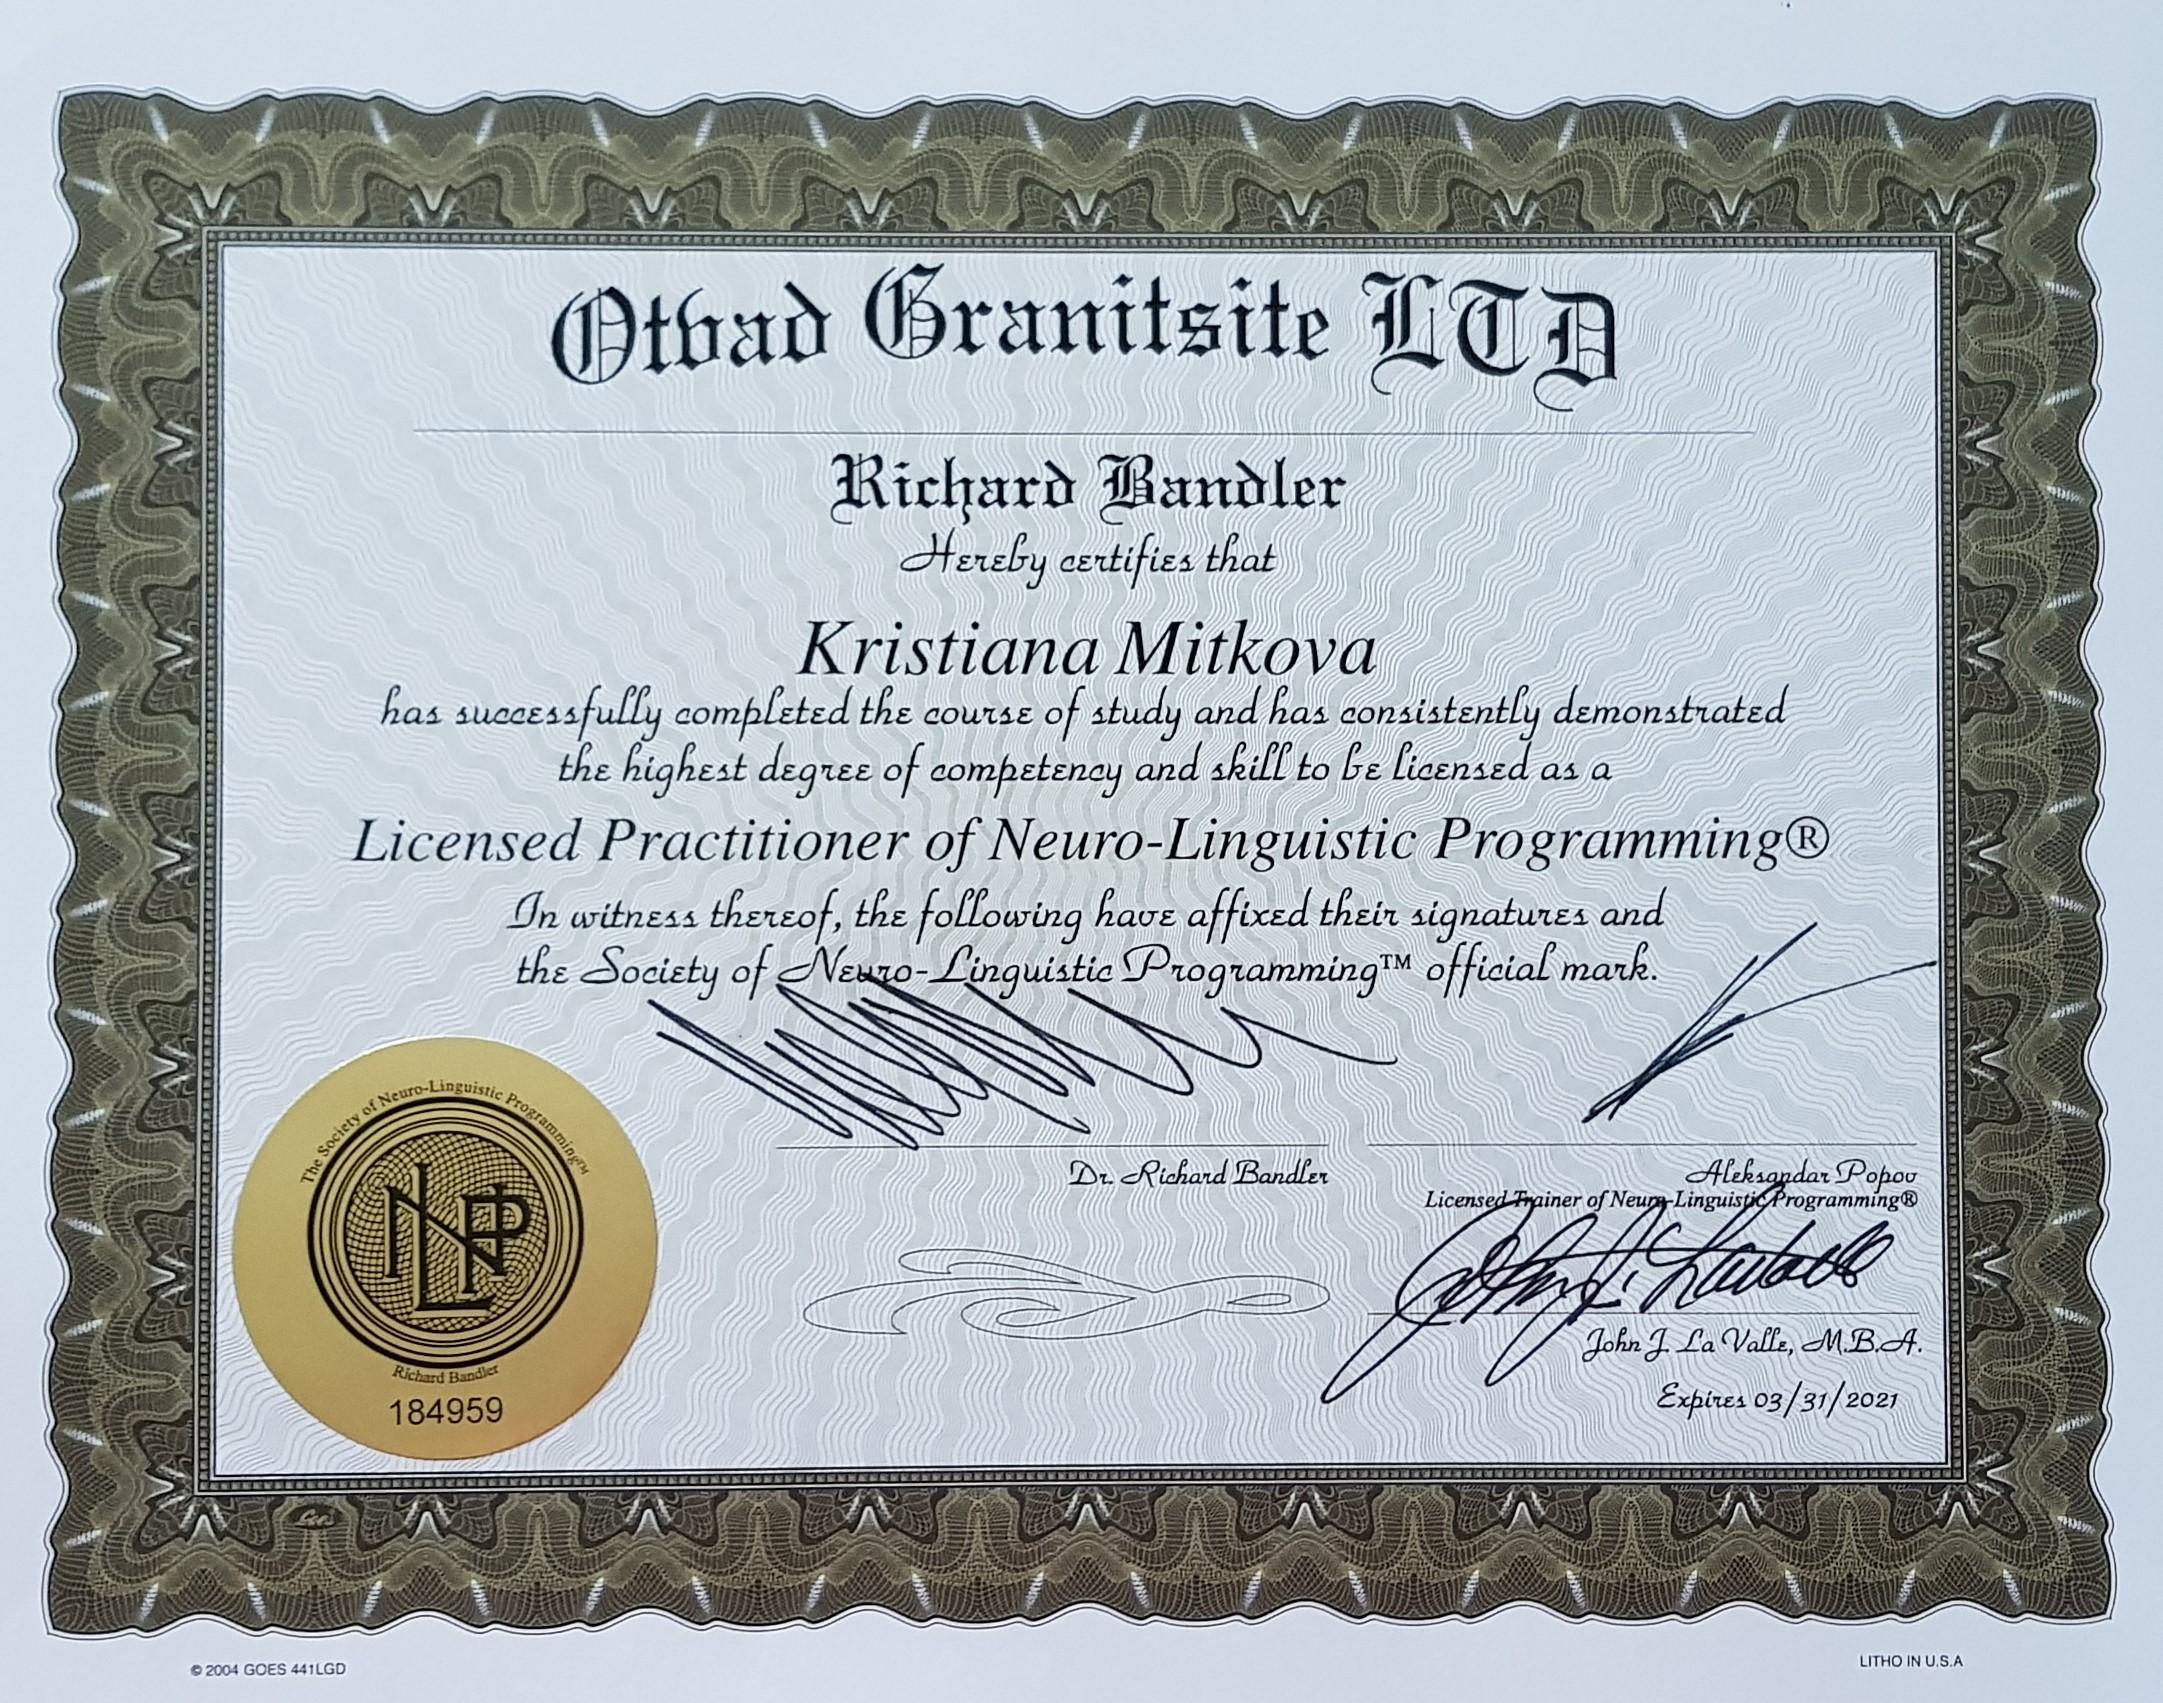 nlp praktic, nlp, НЛП, общество,психология, международно признат сертификат